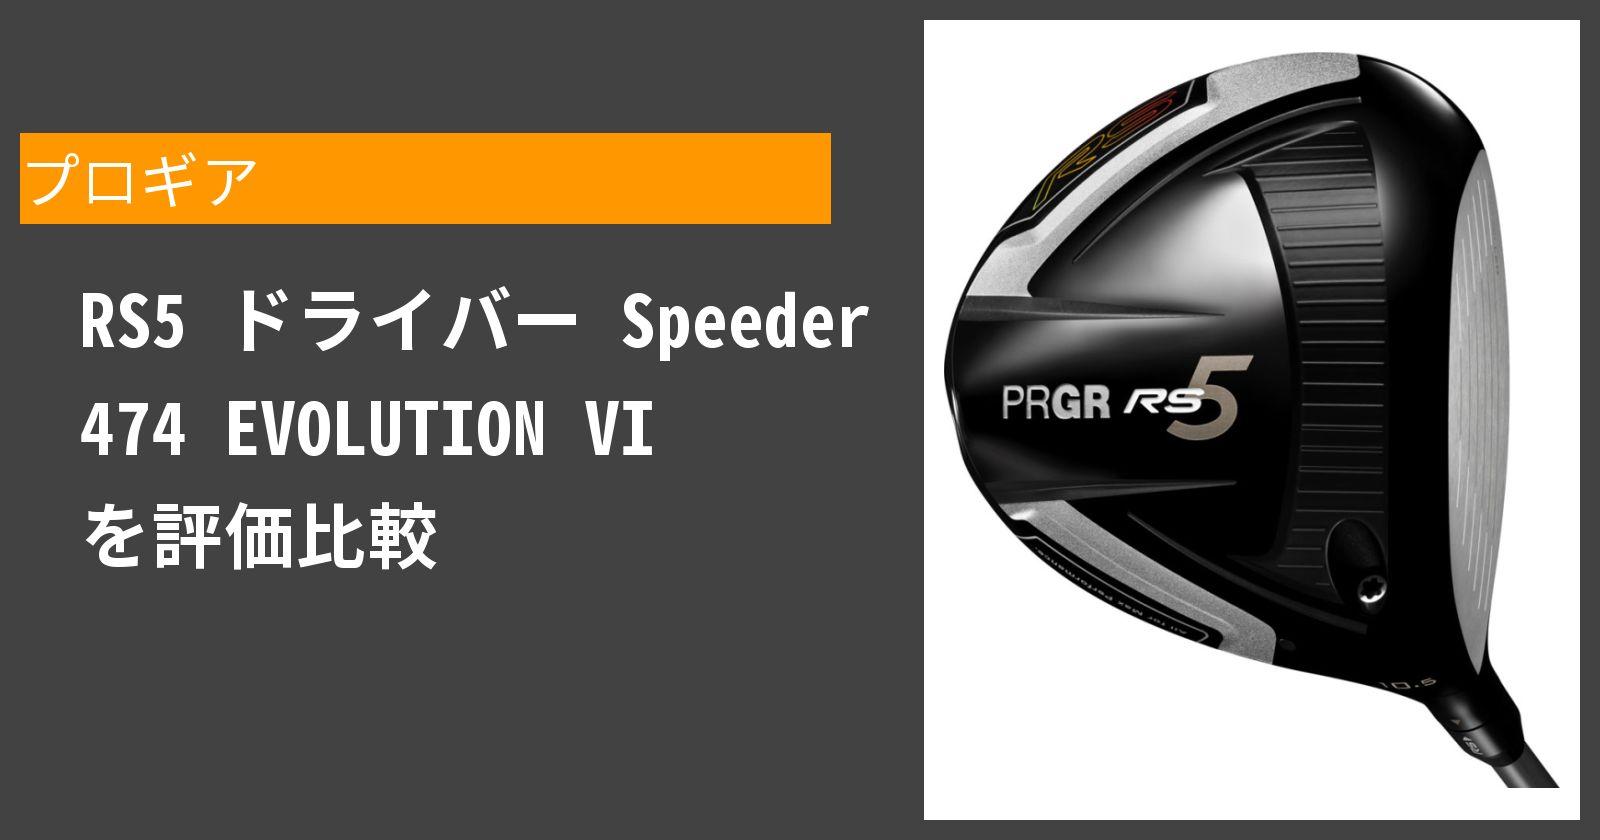 RS5 ドライバー Speeder 474 EVOLUTION VIを徹底評価